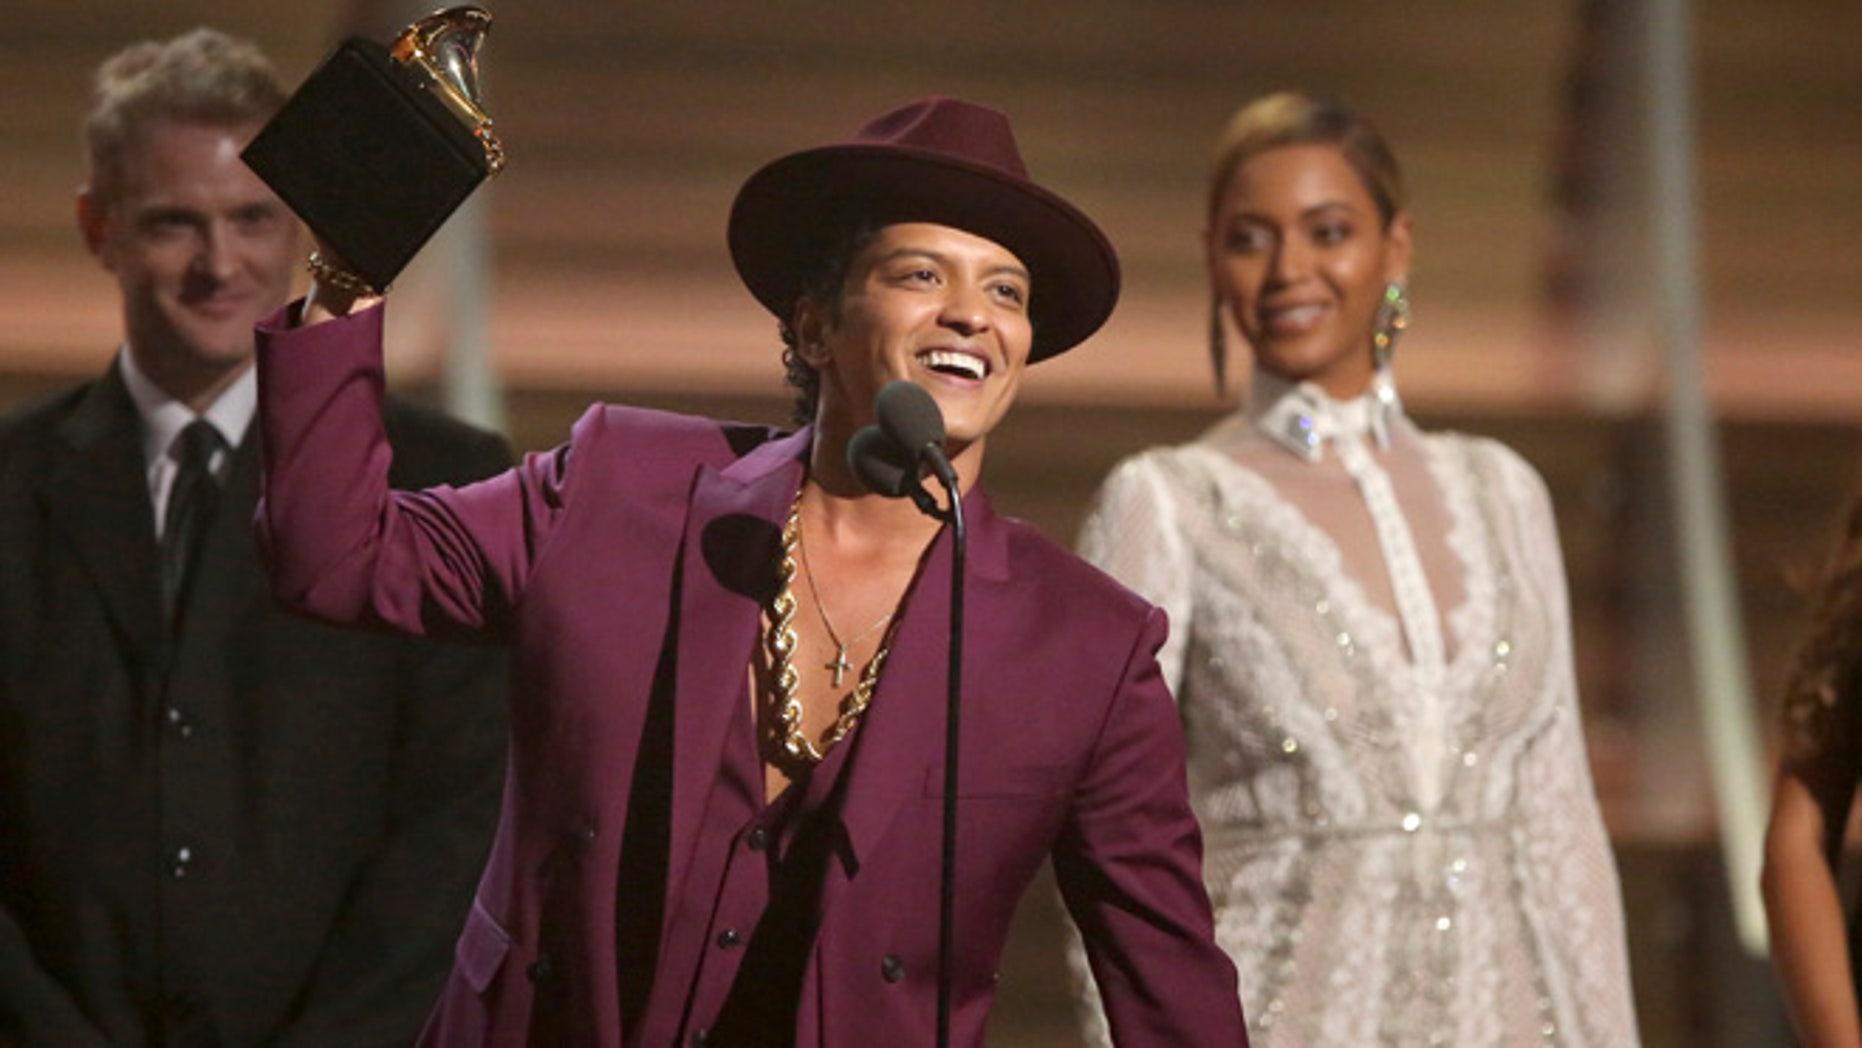 Bruno Mars at the Grammy Awards on Feb. 15, 2016.